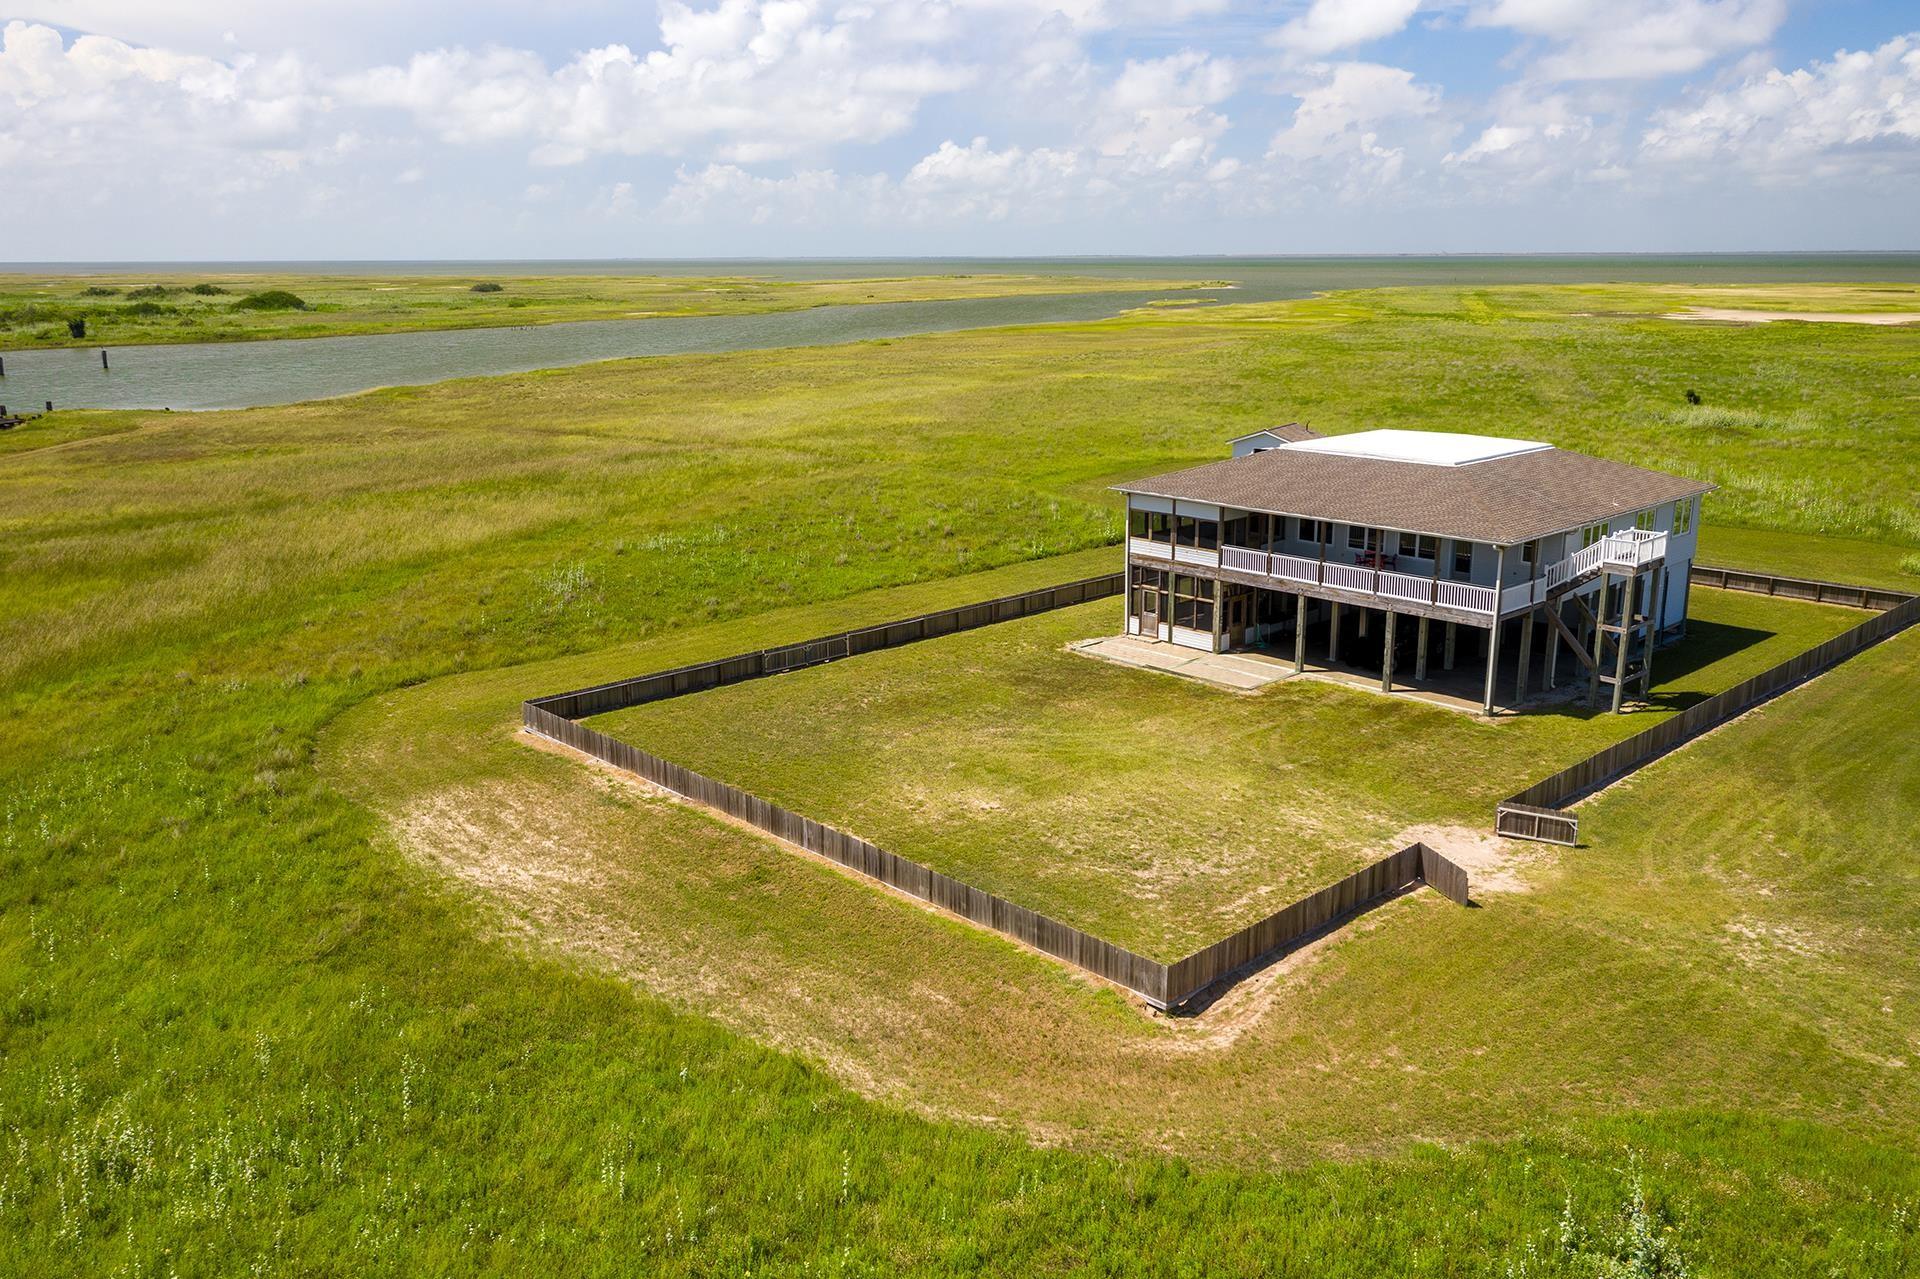 matagorda island retreat a luxury single family home for sale in matagorda, texas christie s international real estate